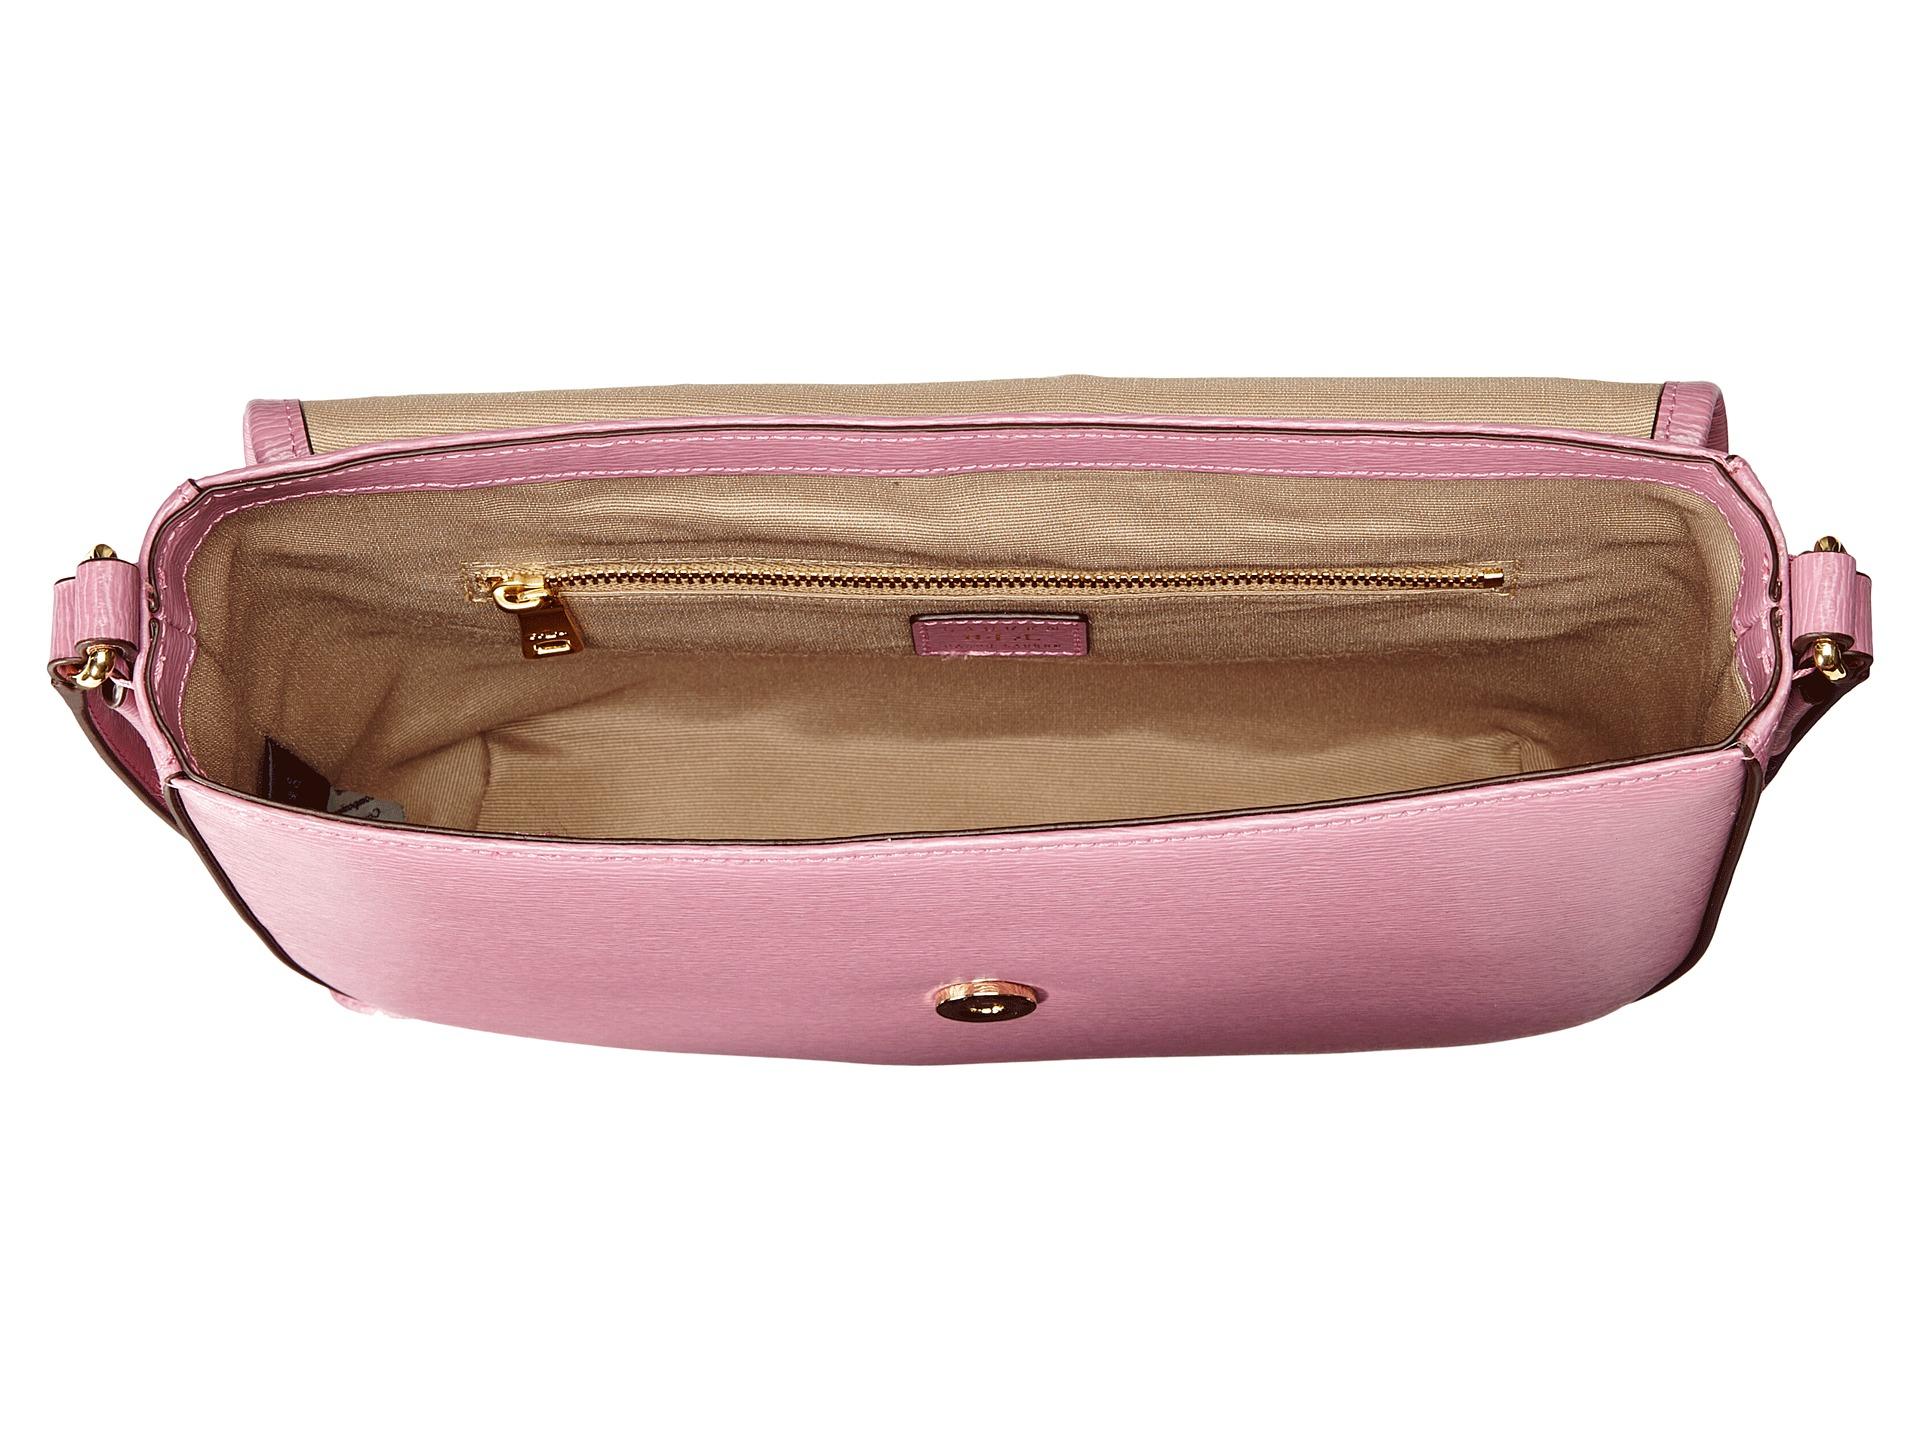 99ea6628fb6a Lyst - Lauren by Ralph Lauren Tate Messenger in Pink